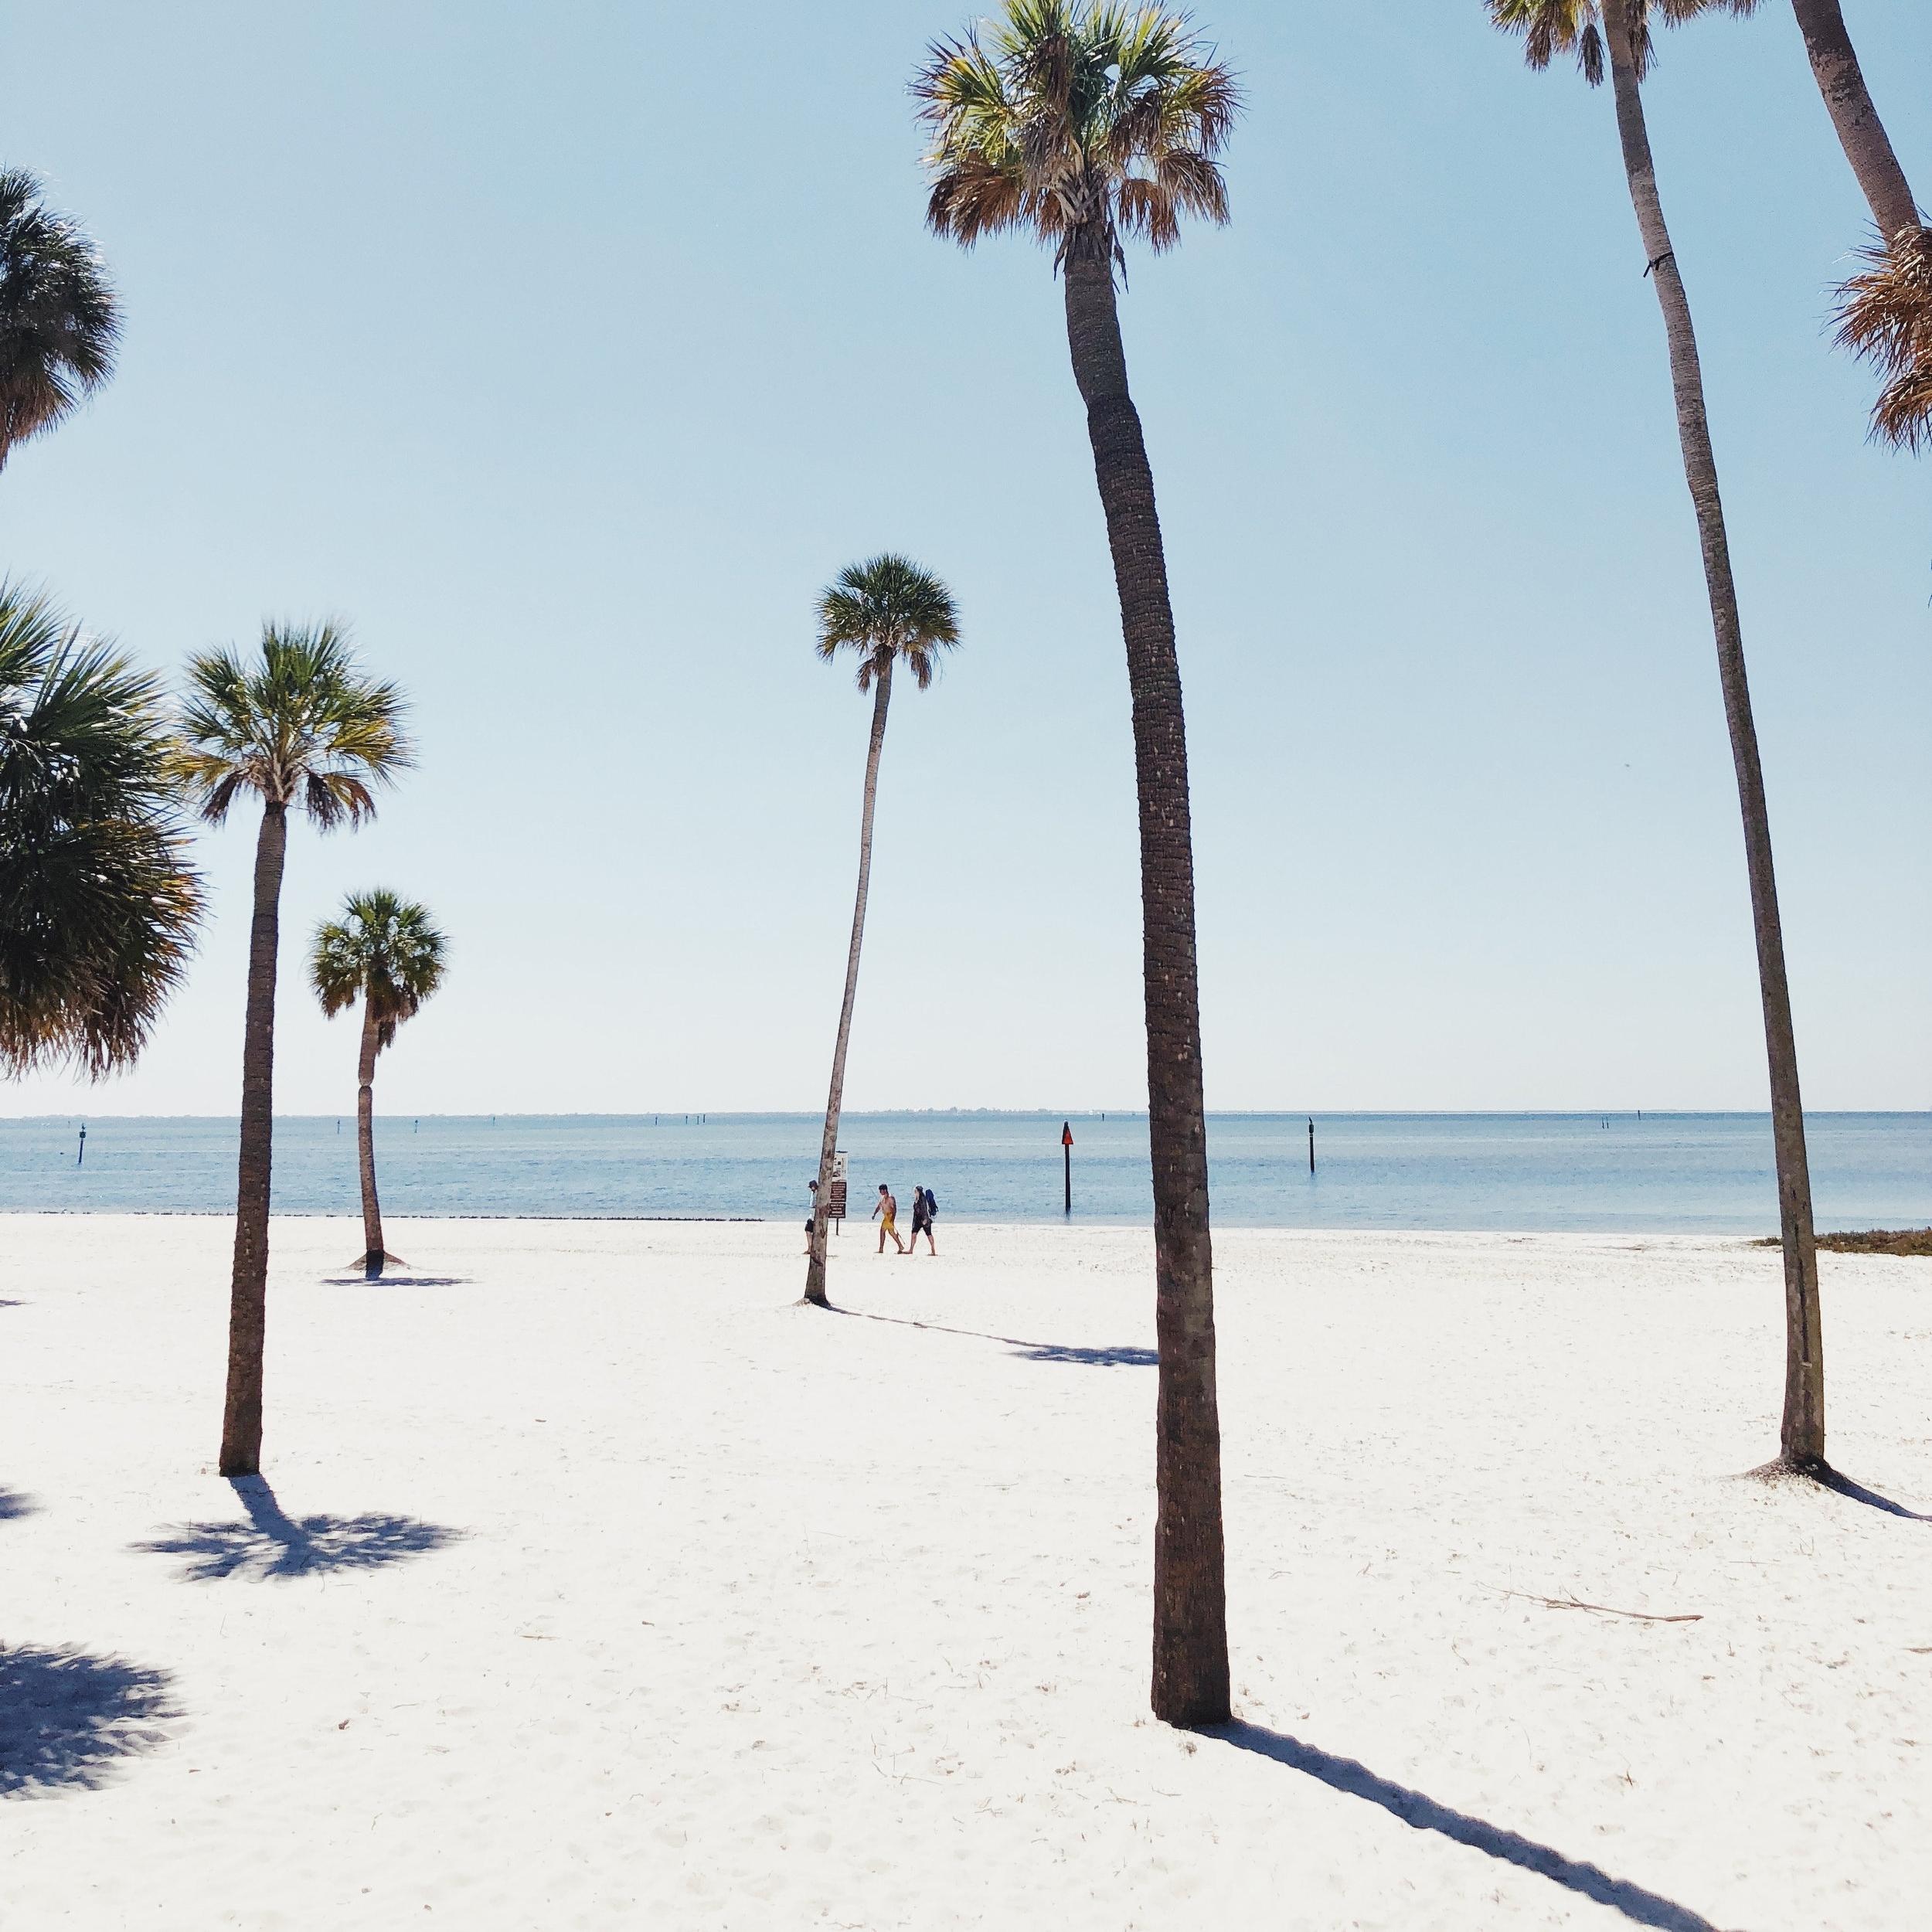 Fort Lauderdale - Megan Hardt